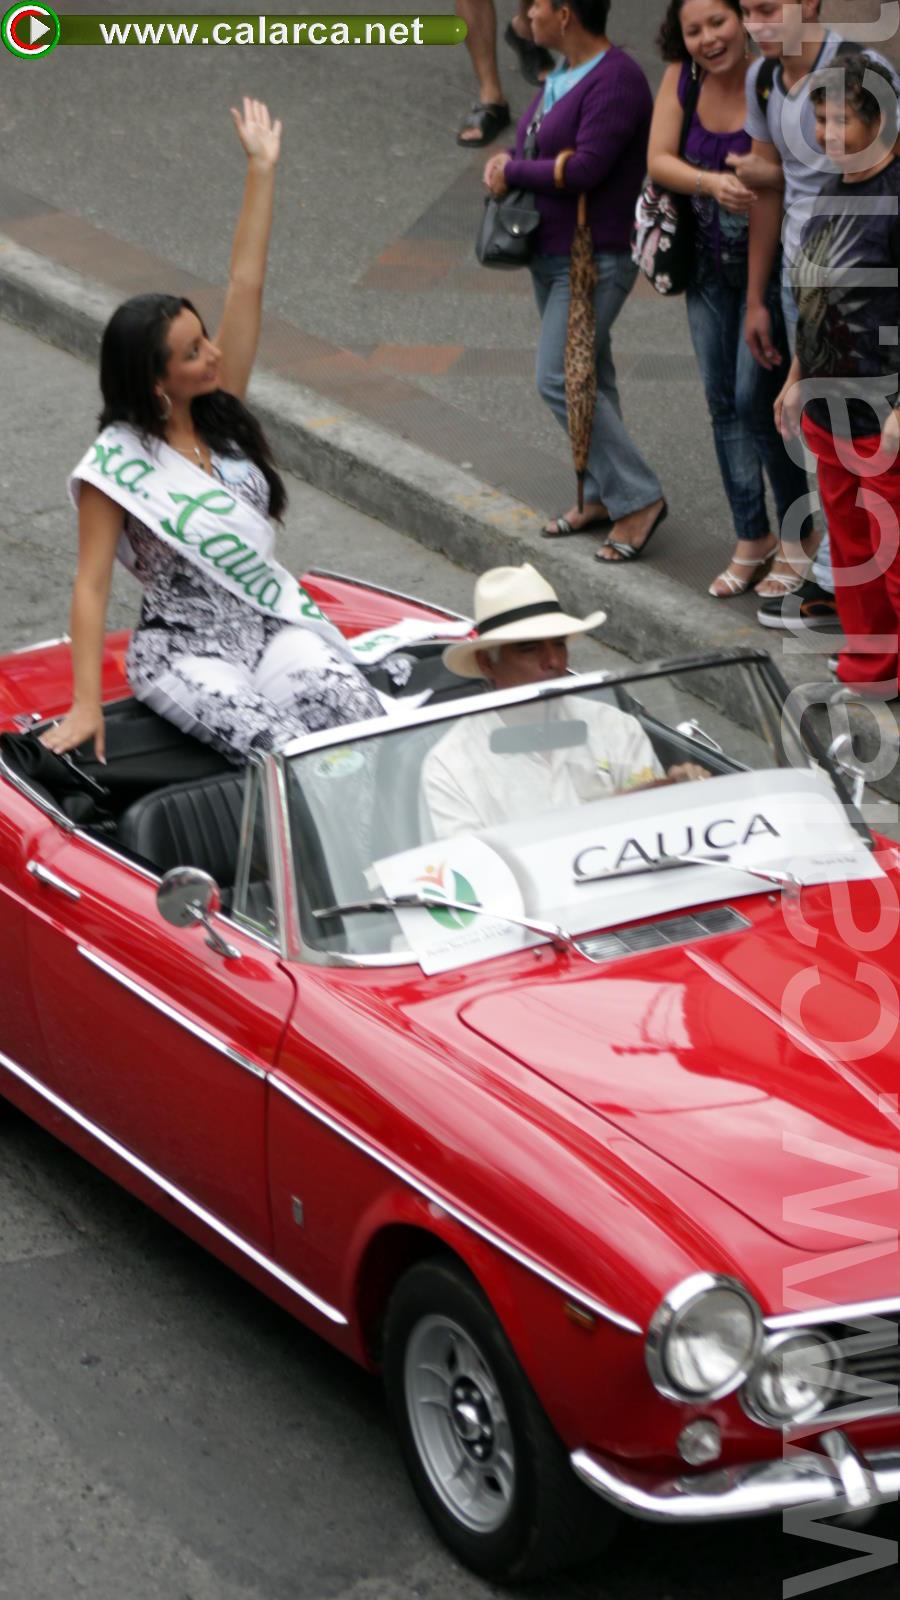 Cauca - Tania Marcela Velasco Martínez